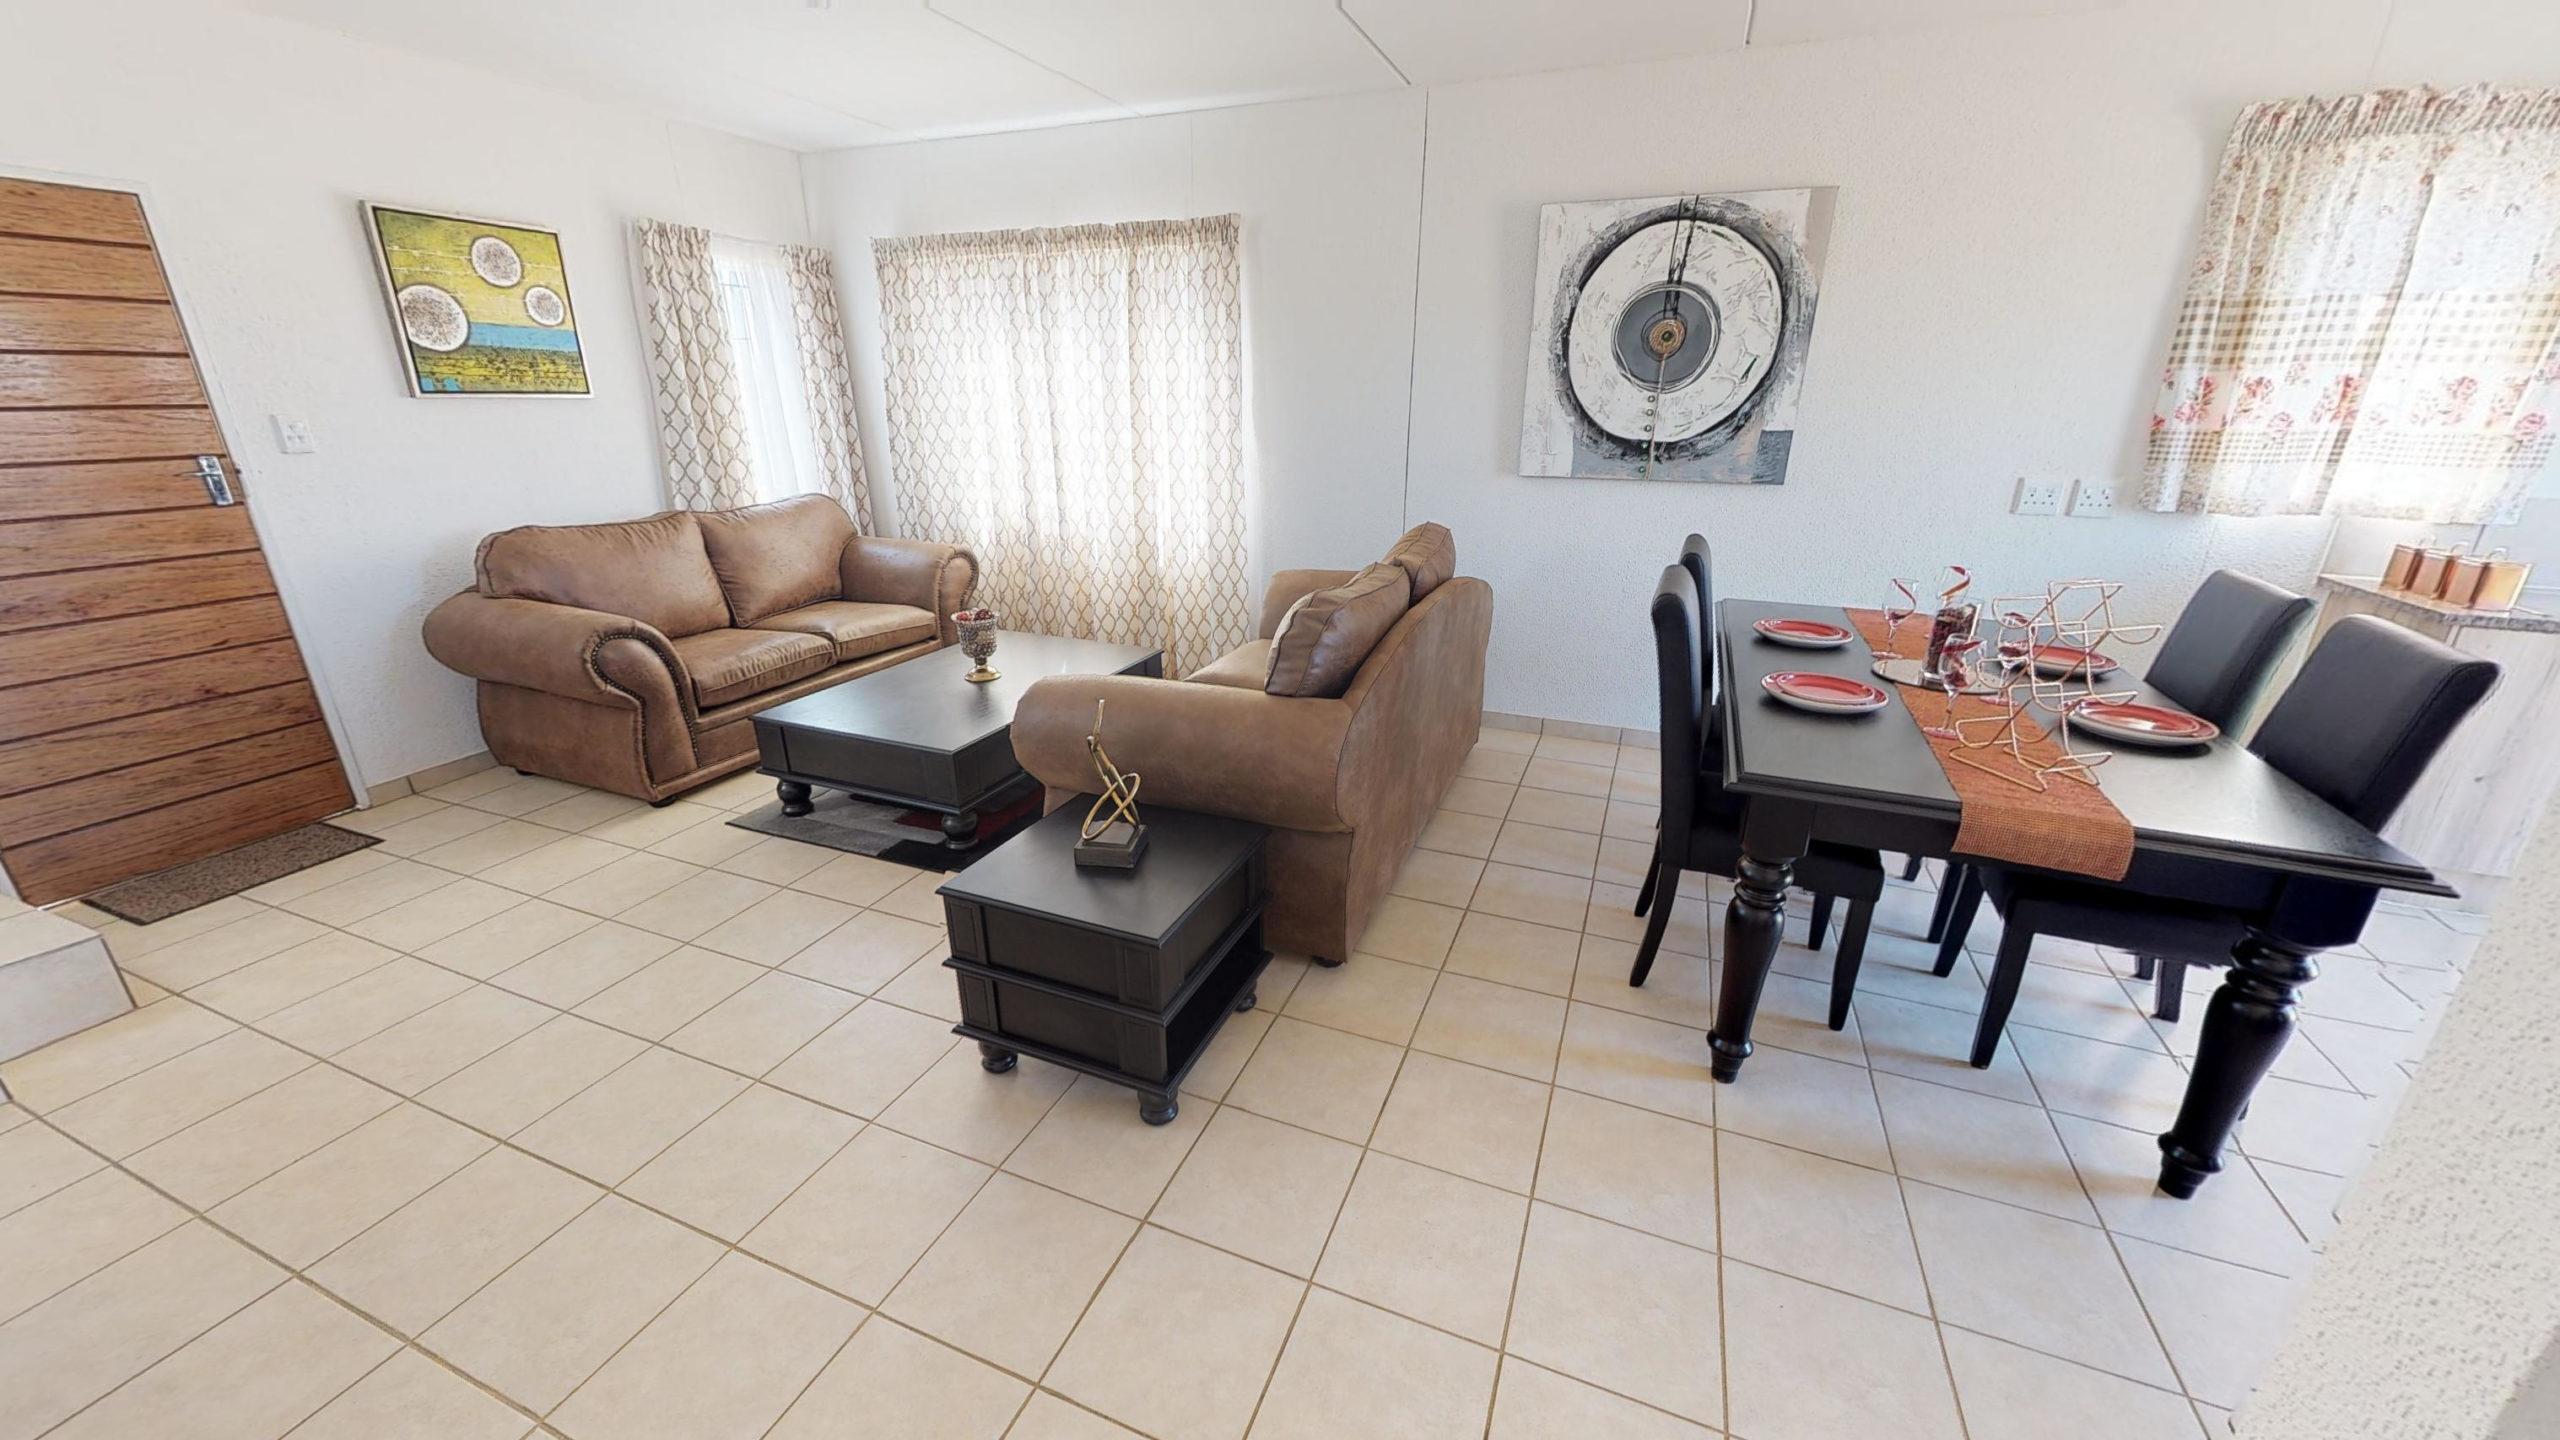 Savanna City, Homes for Sale in Walkersville, Gauteng - Lounge